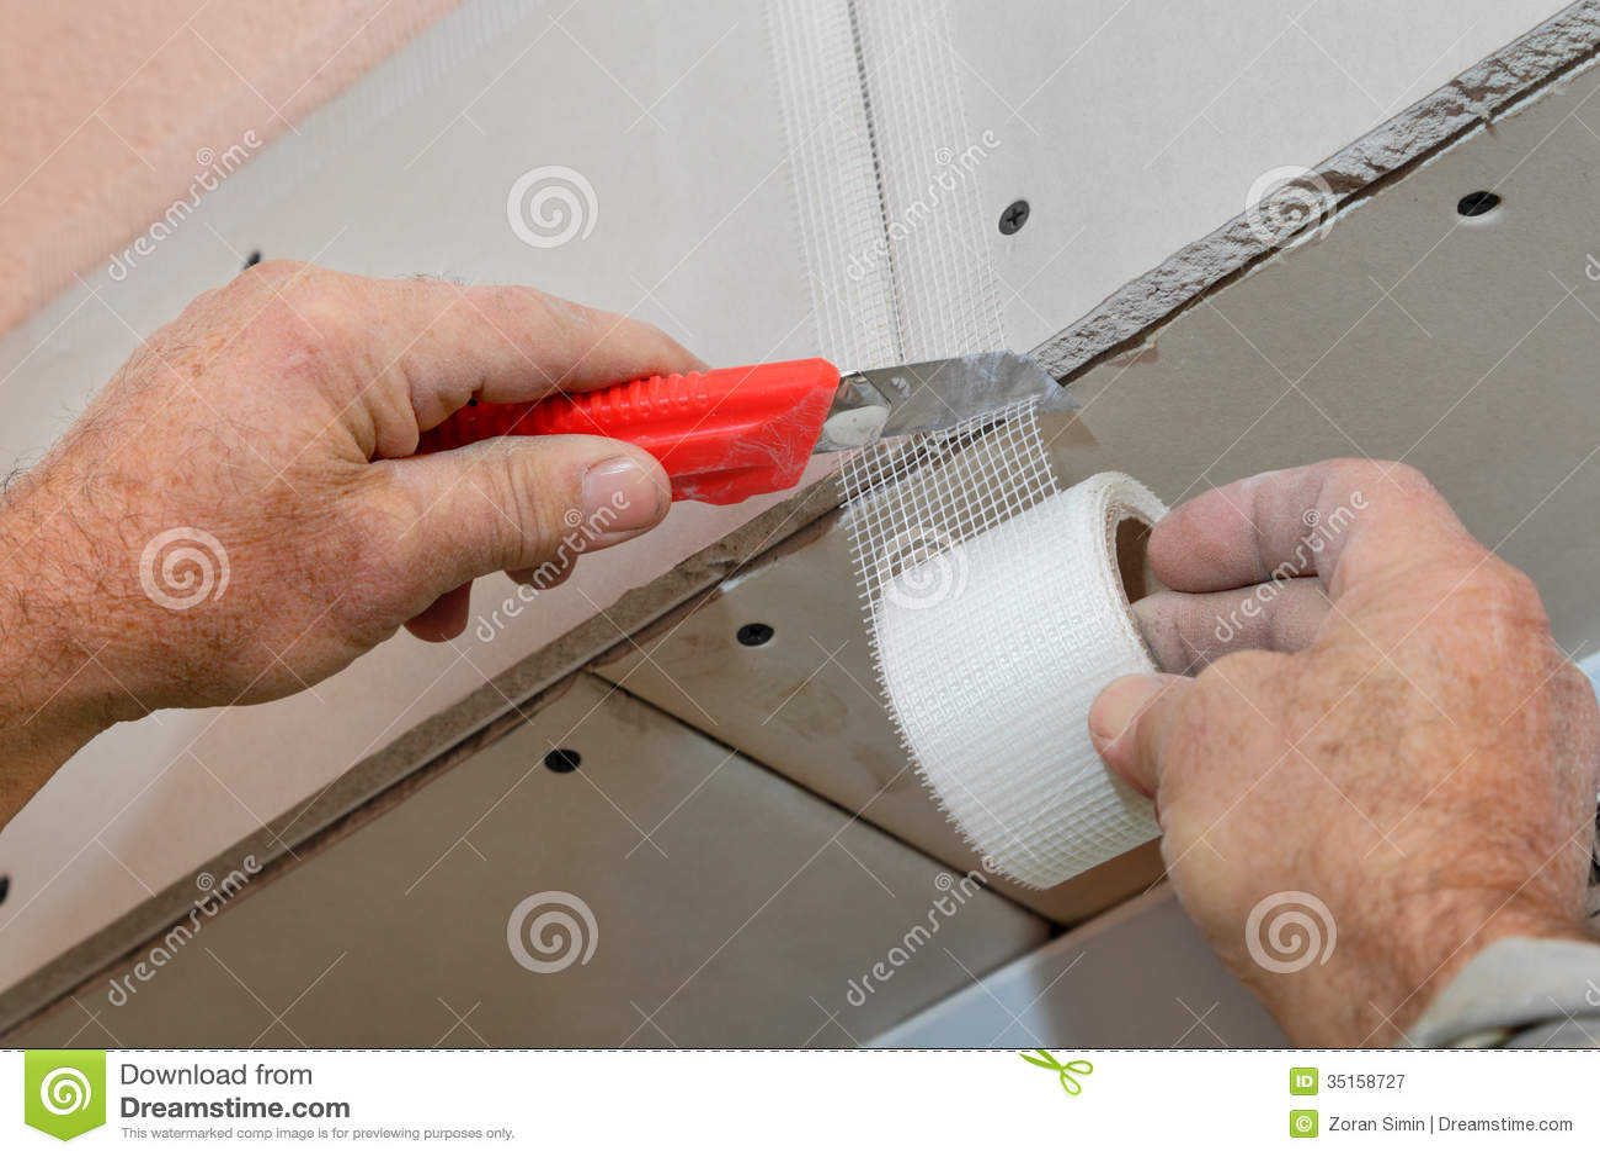 Gypsum Board Installation : Fiber mesh cut stock image of renovating